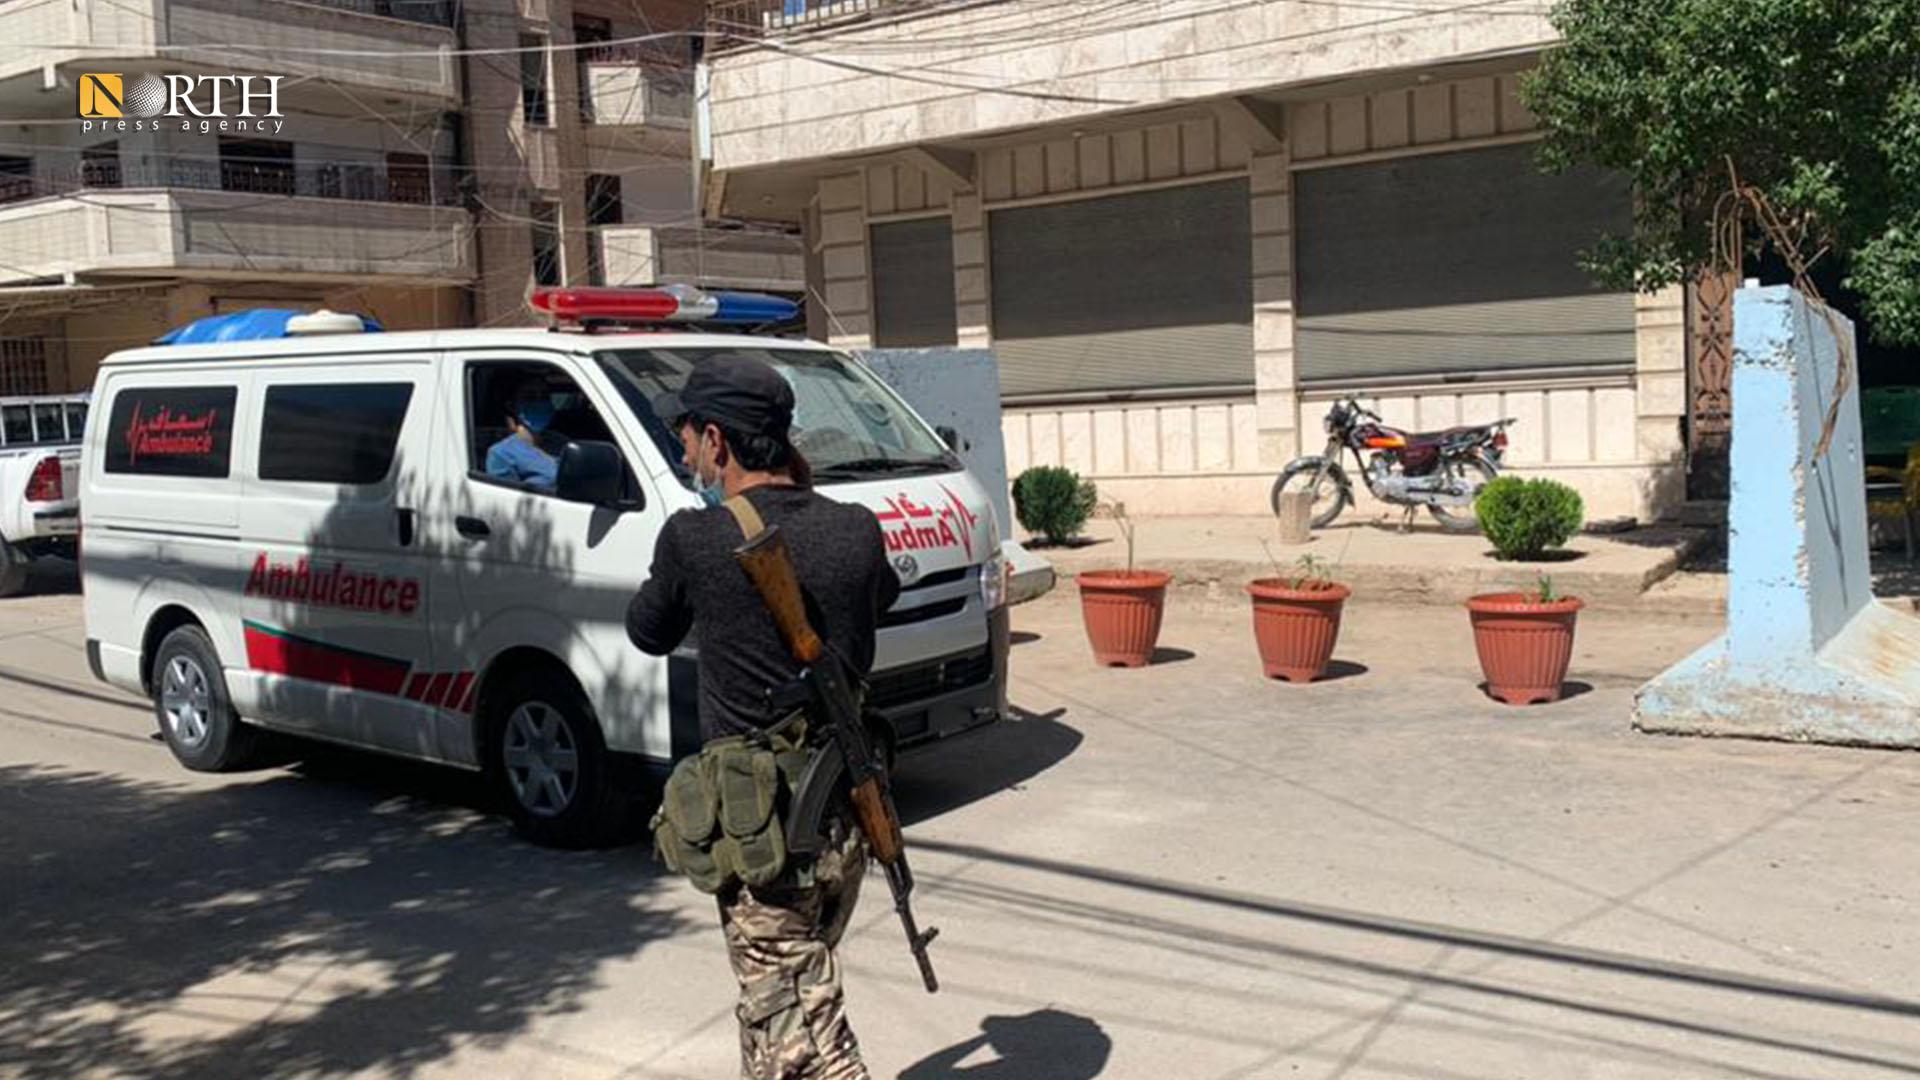 Kurdish Red Crescent ambulances arrive at Shahid Khabat Hospital in Qamishli- North Press